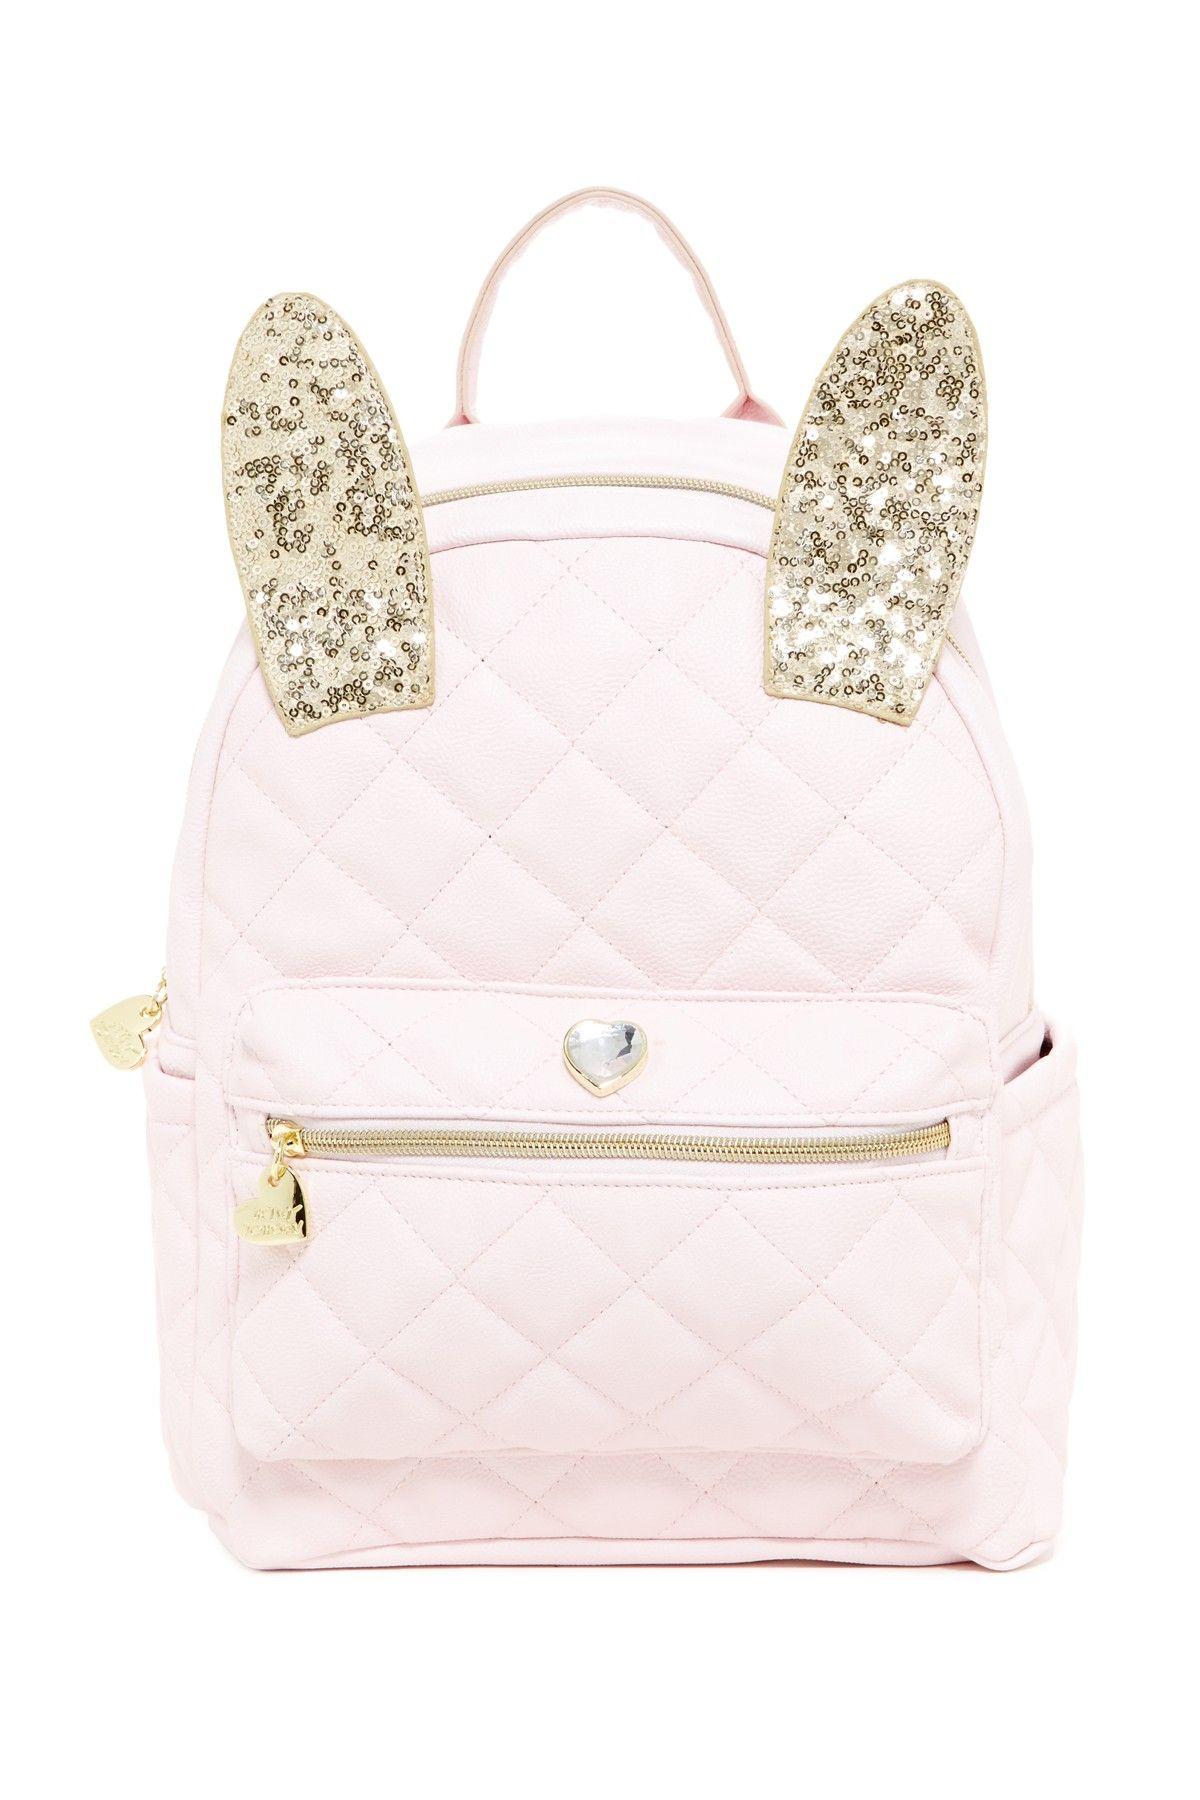 57d4e39b6f Betsey Johnson | Disco Bunny Backpack | Neat Stuff | Bags, Betsey ...